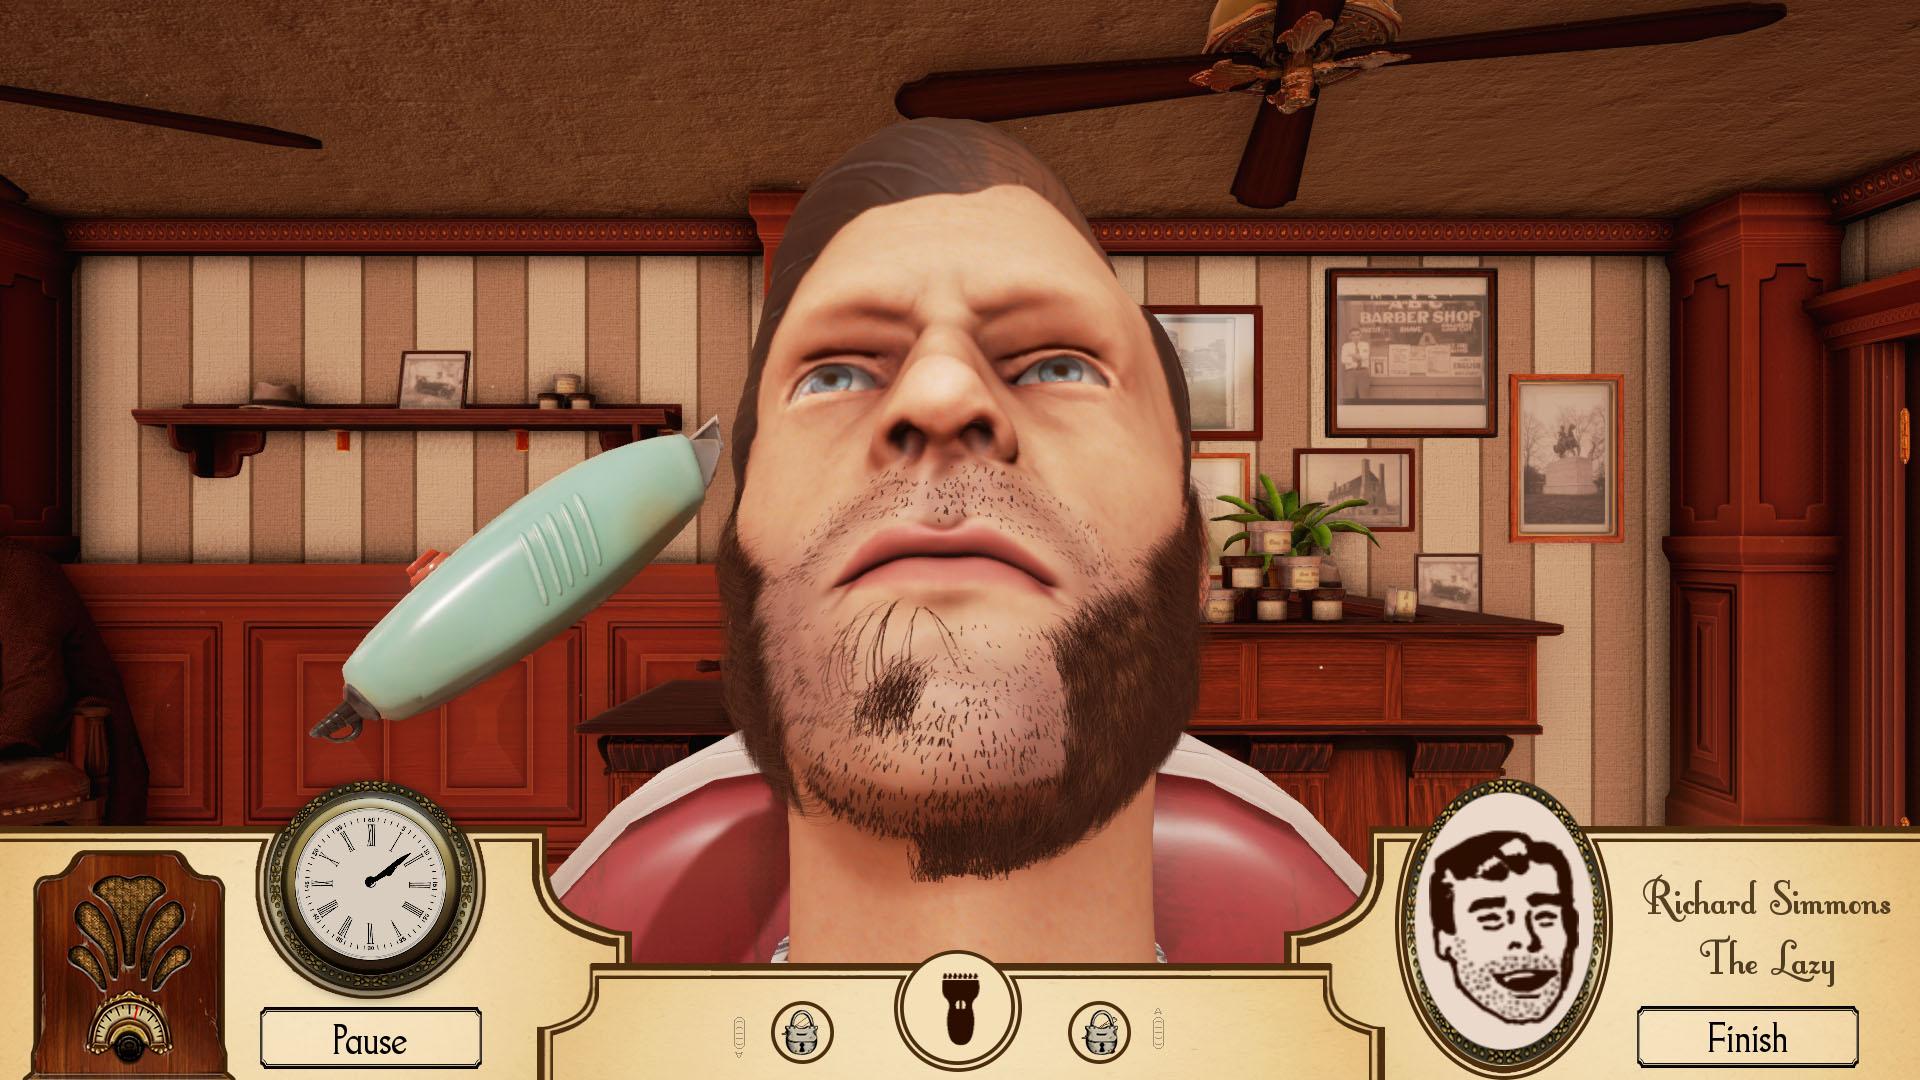 Barber Etymology : The Barber Shop download - Baixaki